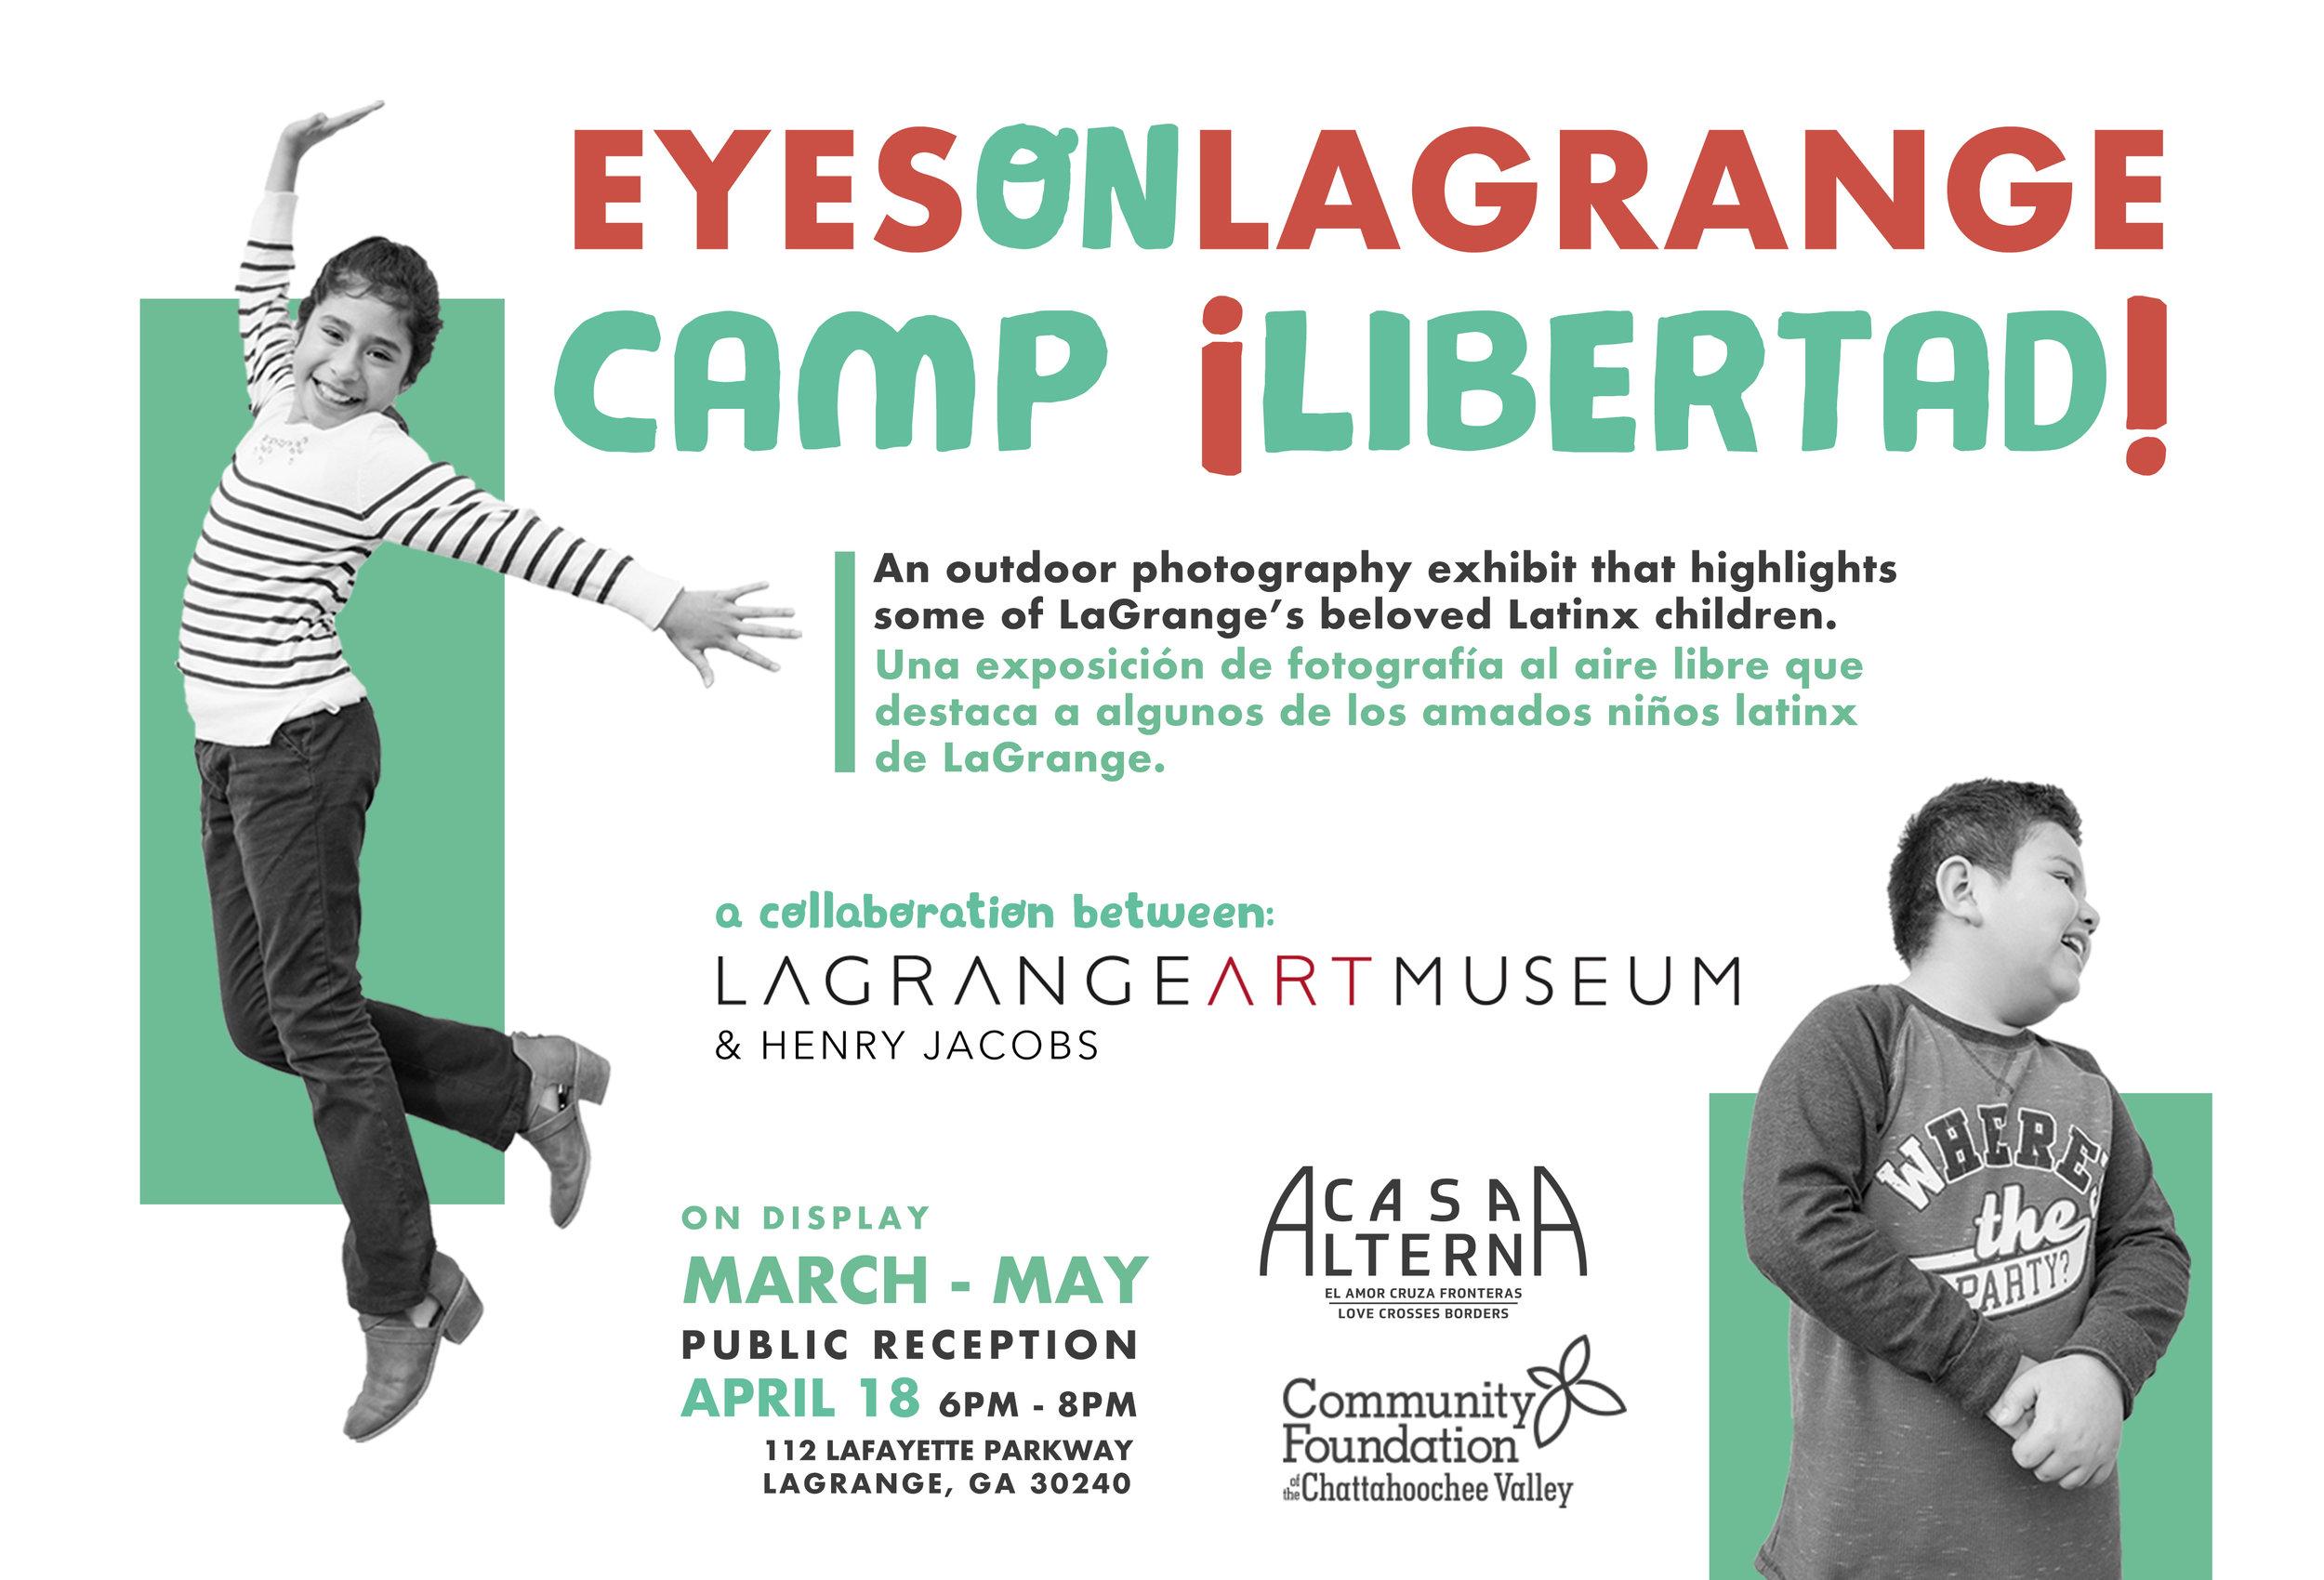 Eyes on LaGrange_Camp Libertad_Promo.jpg